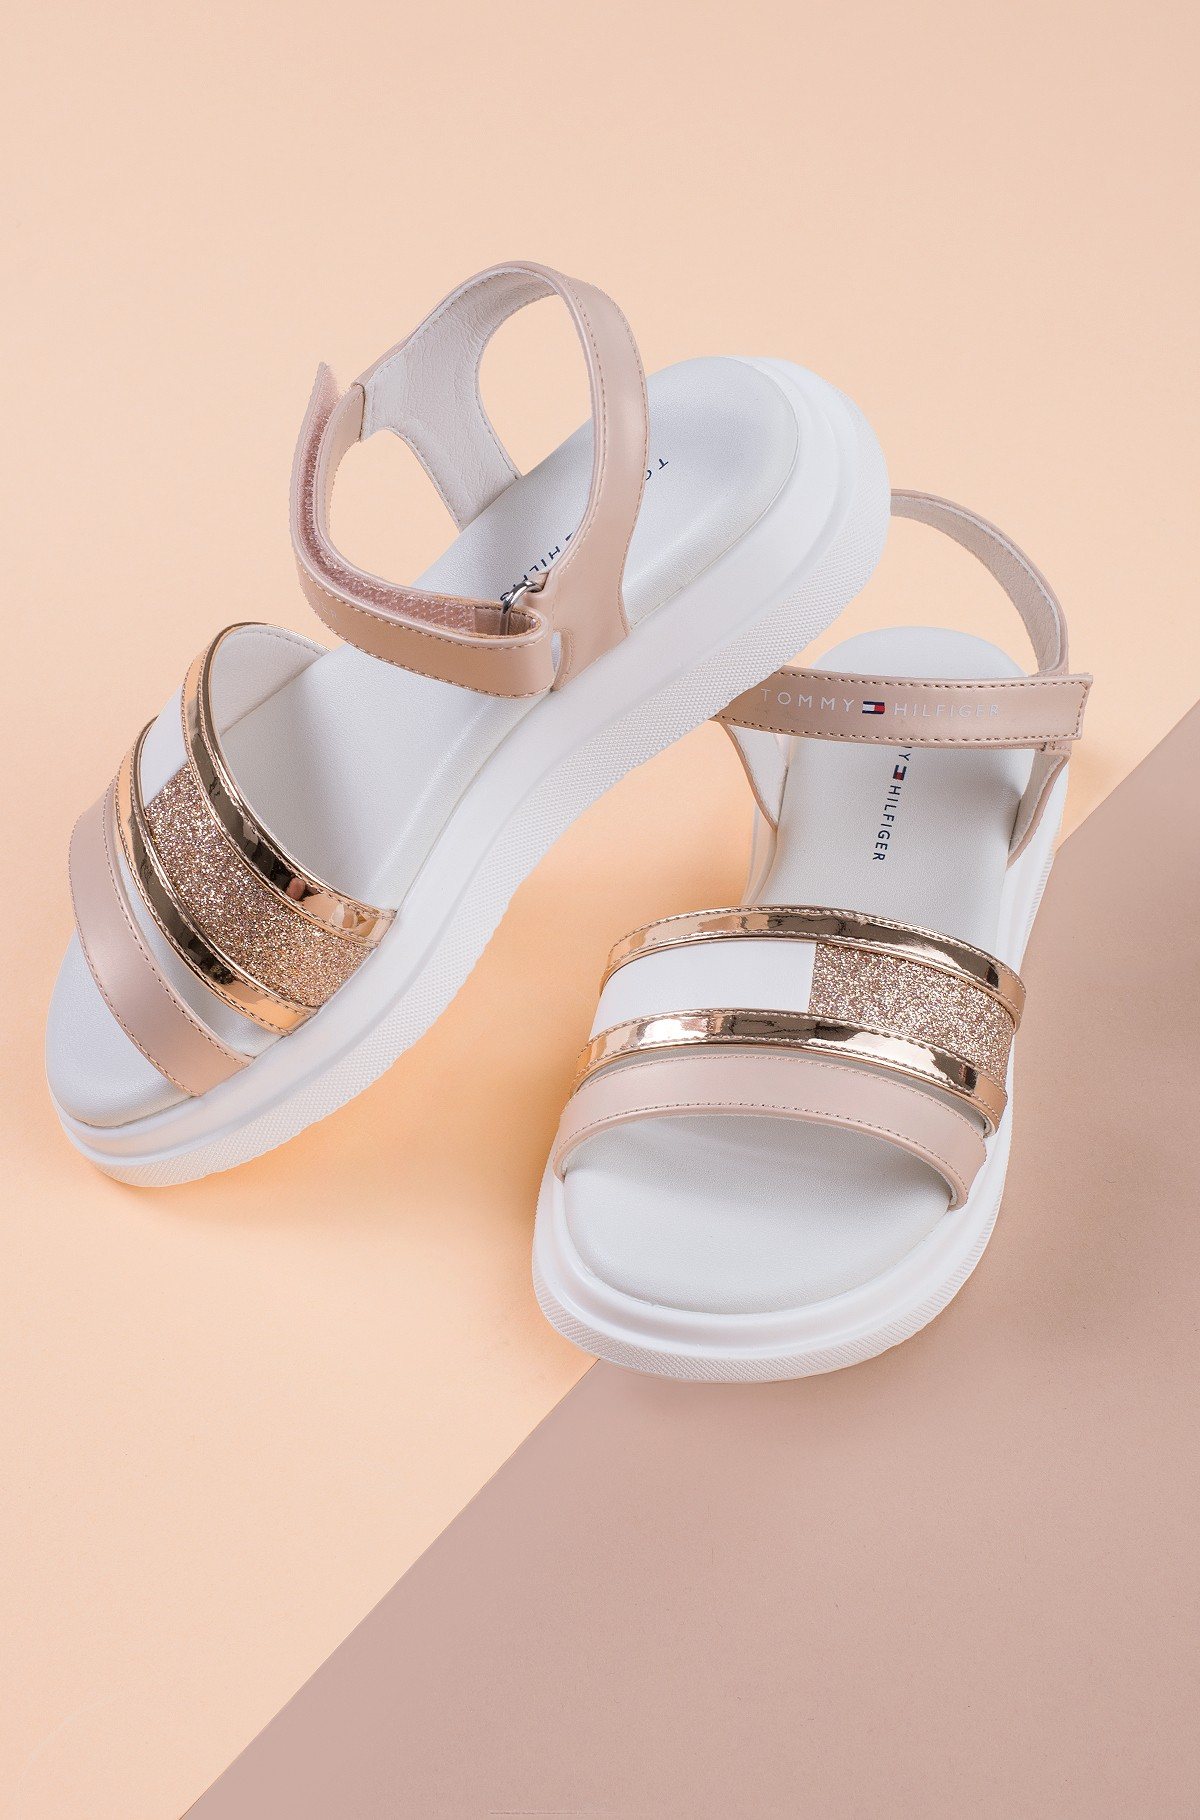 Sandals T3A2-31038-1160341-full-1